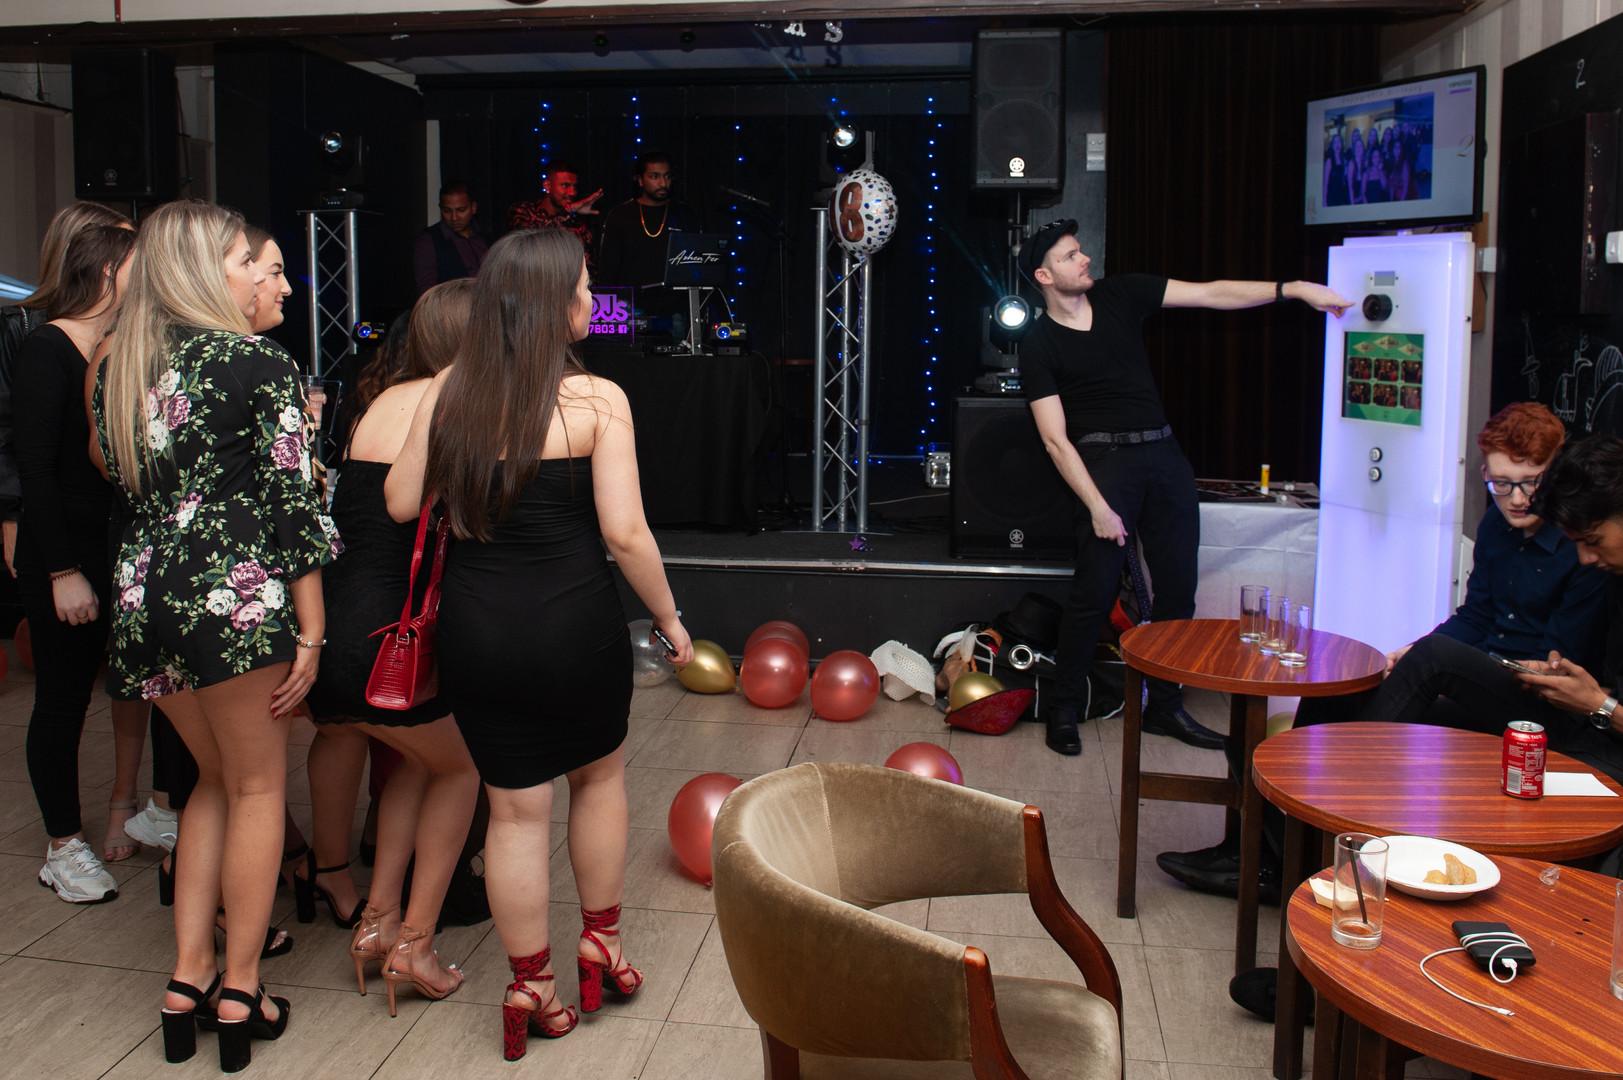 2019-11-30 Ishitas 18th Birthday Party-8